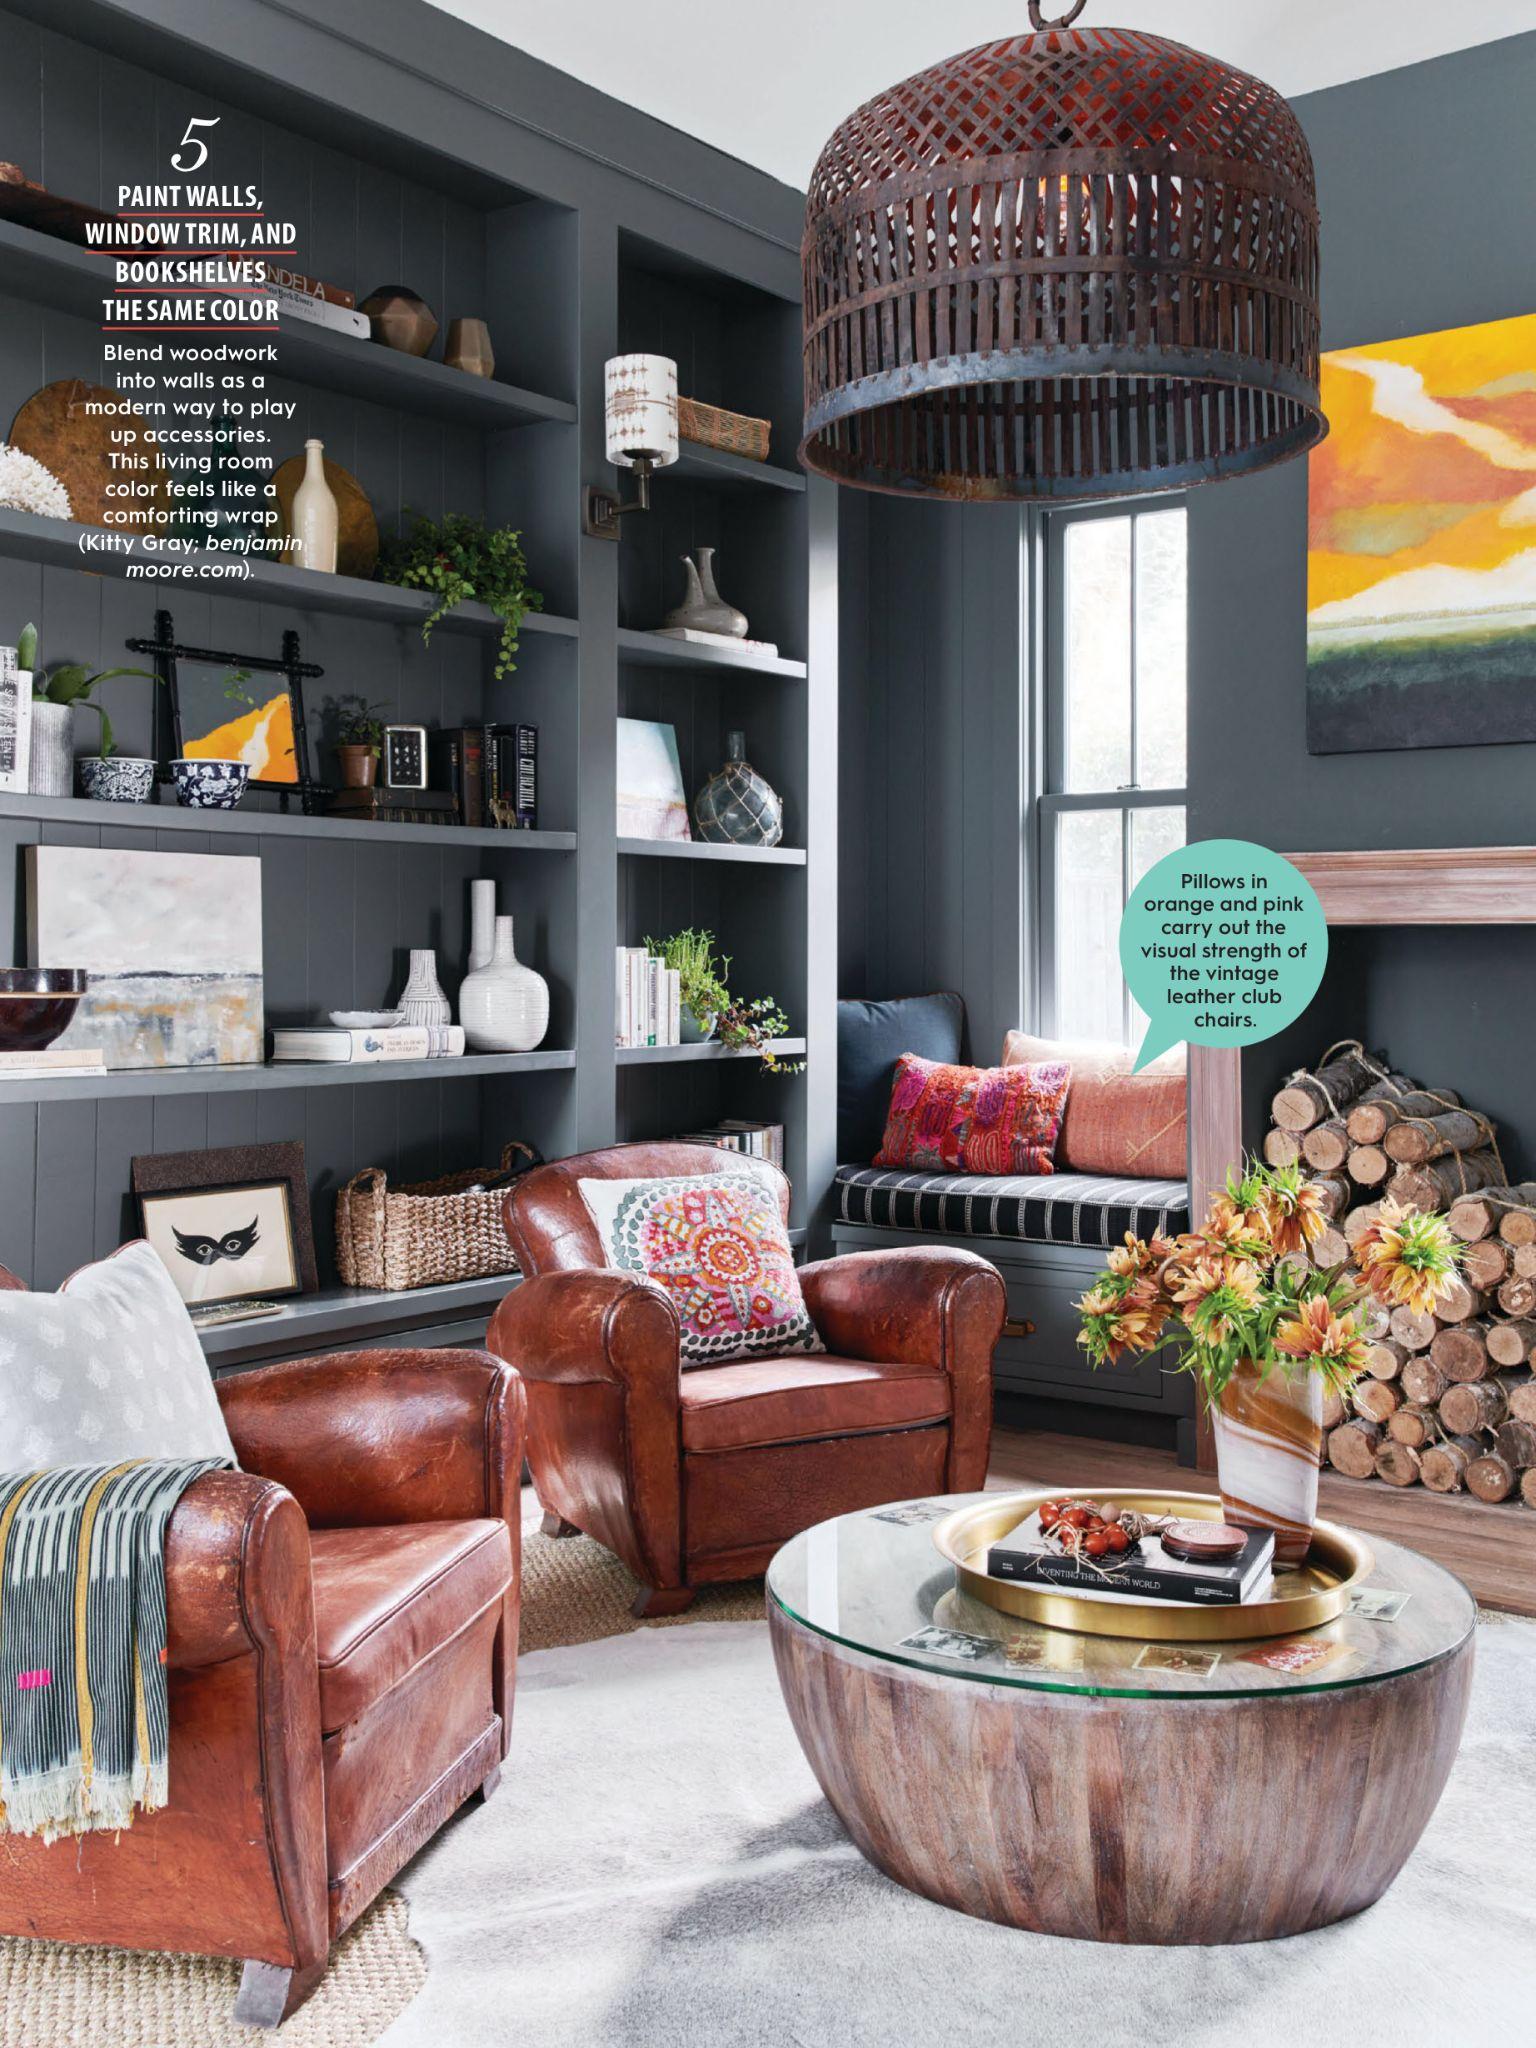 742f2e8024c88521d7b2418b971073da - January 2019 Better Homes And Gardens Magazine